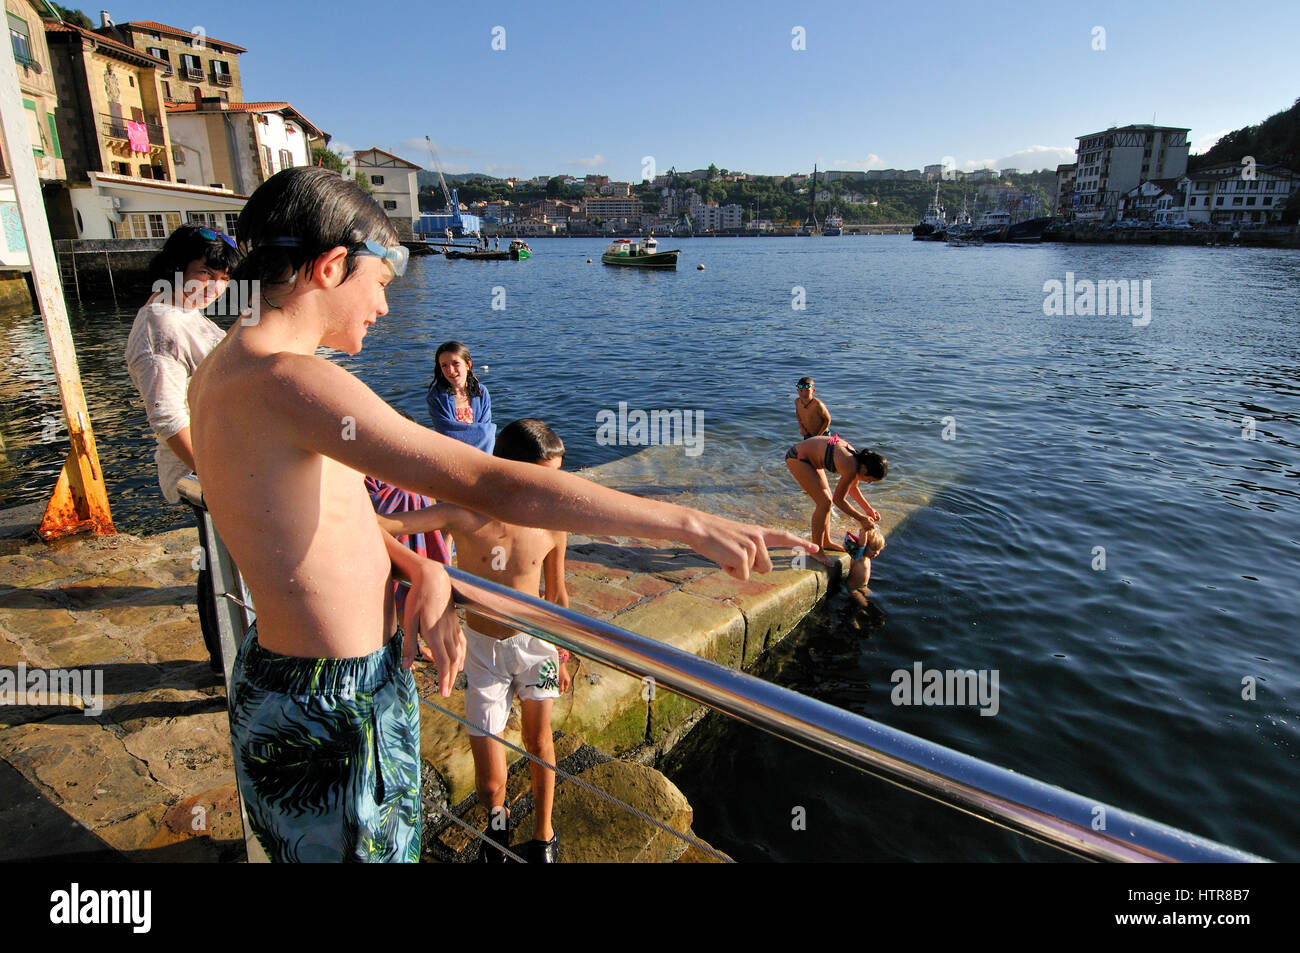 Pasaia, Gipuzkoa, Basque community, Spain - Stock Image